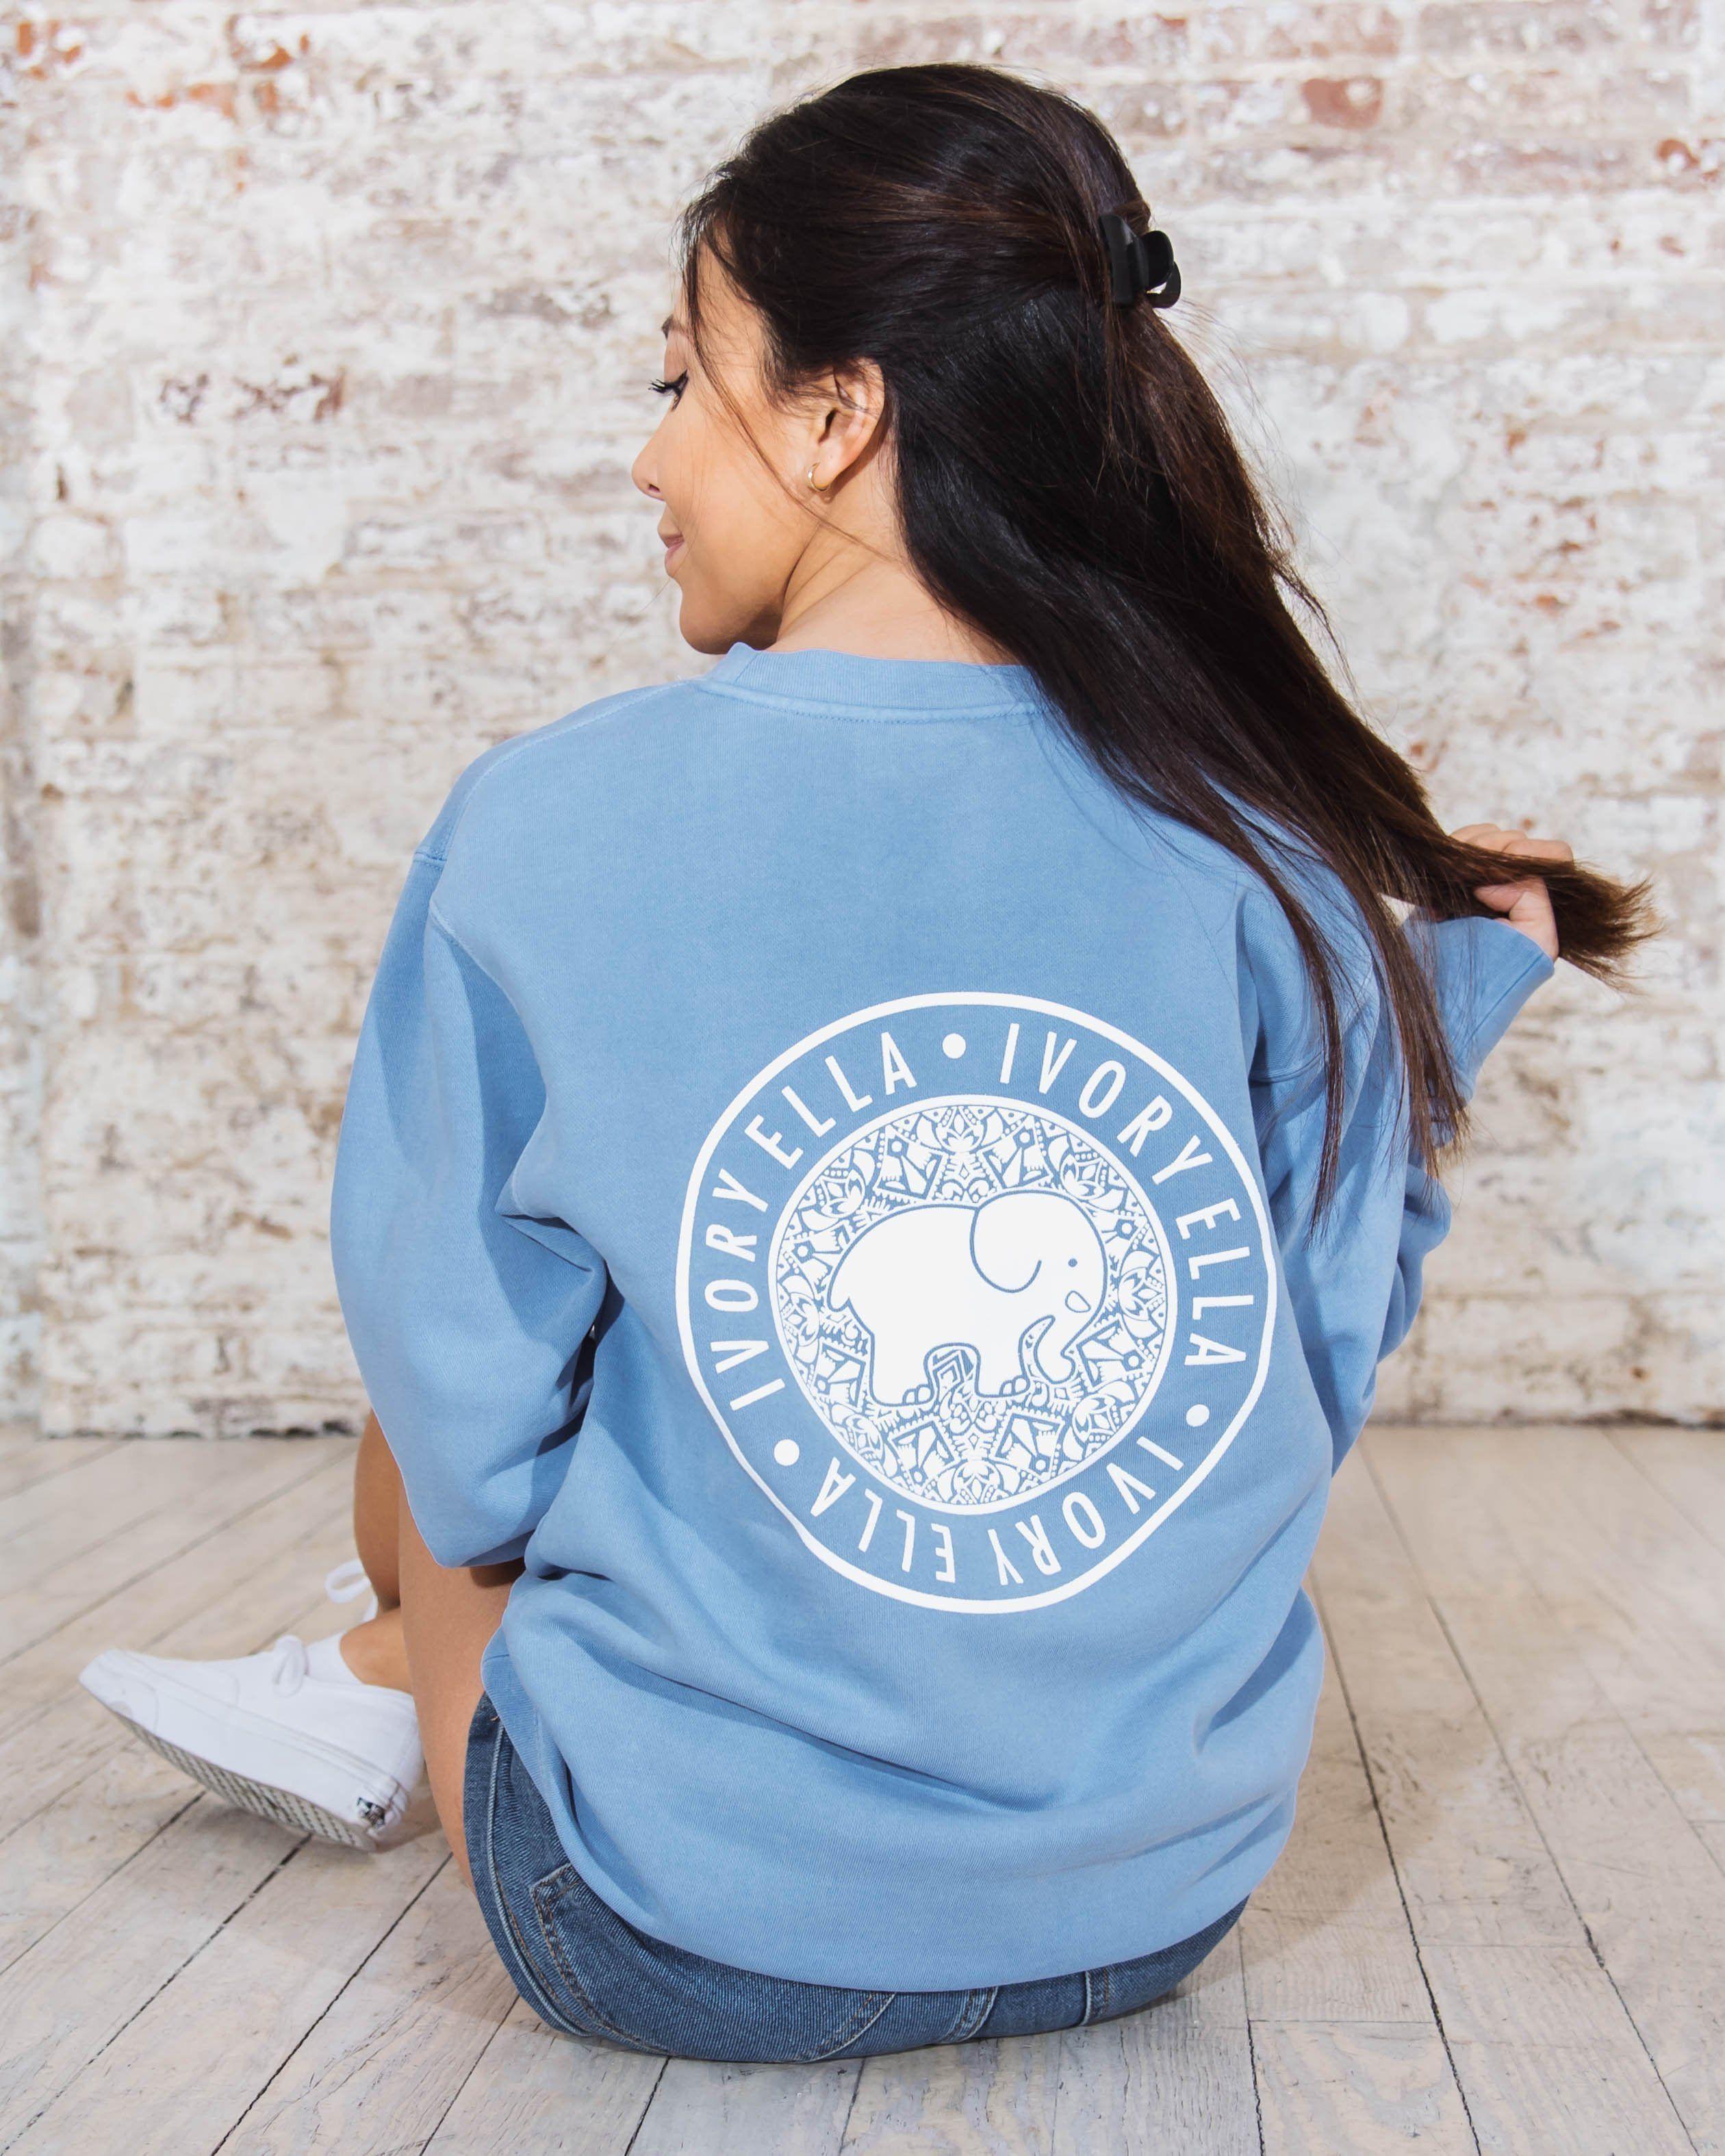 Light Blue Crew Neck Sweatshirt Light Blue Sweatshirt Sweatshirts Blue Crew